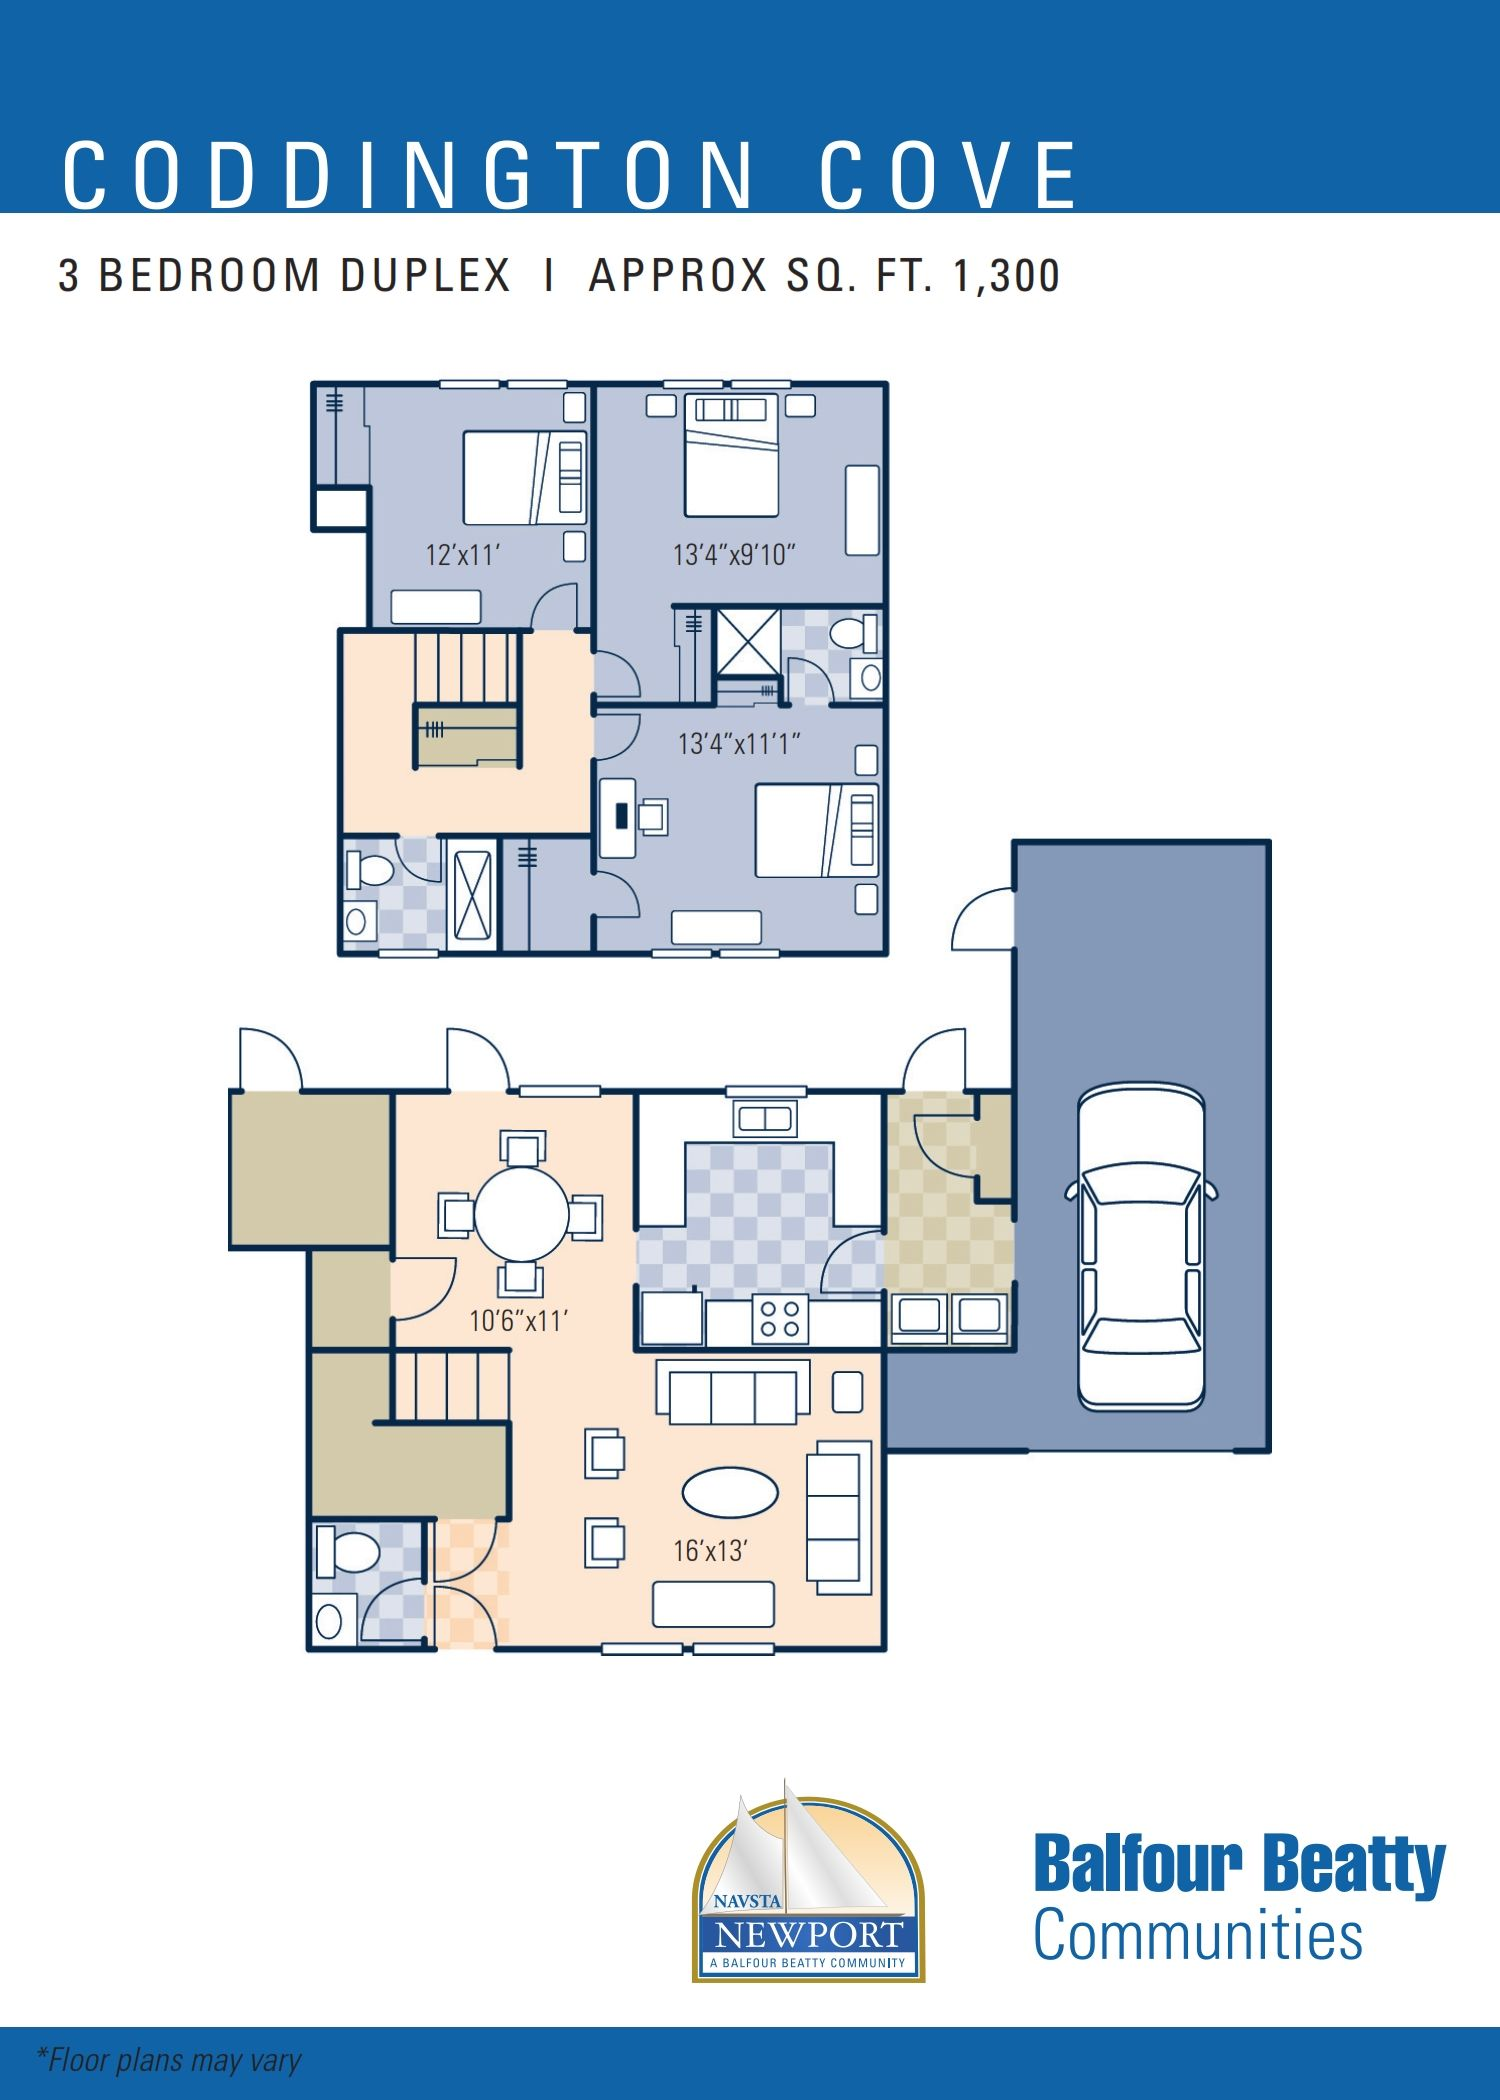 ns newport coddington cove neighborhood 3 bedroom duplex style rh pinterest com